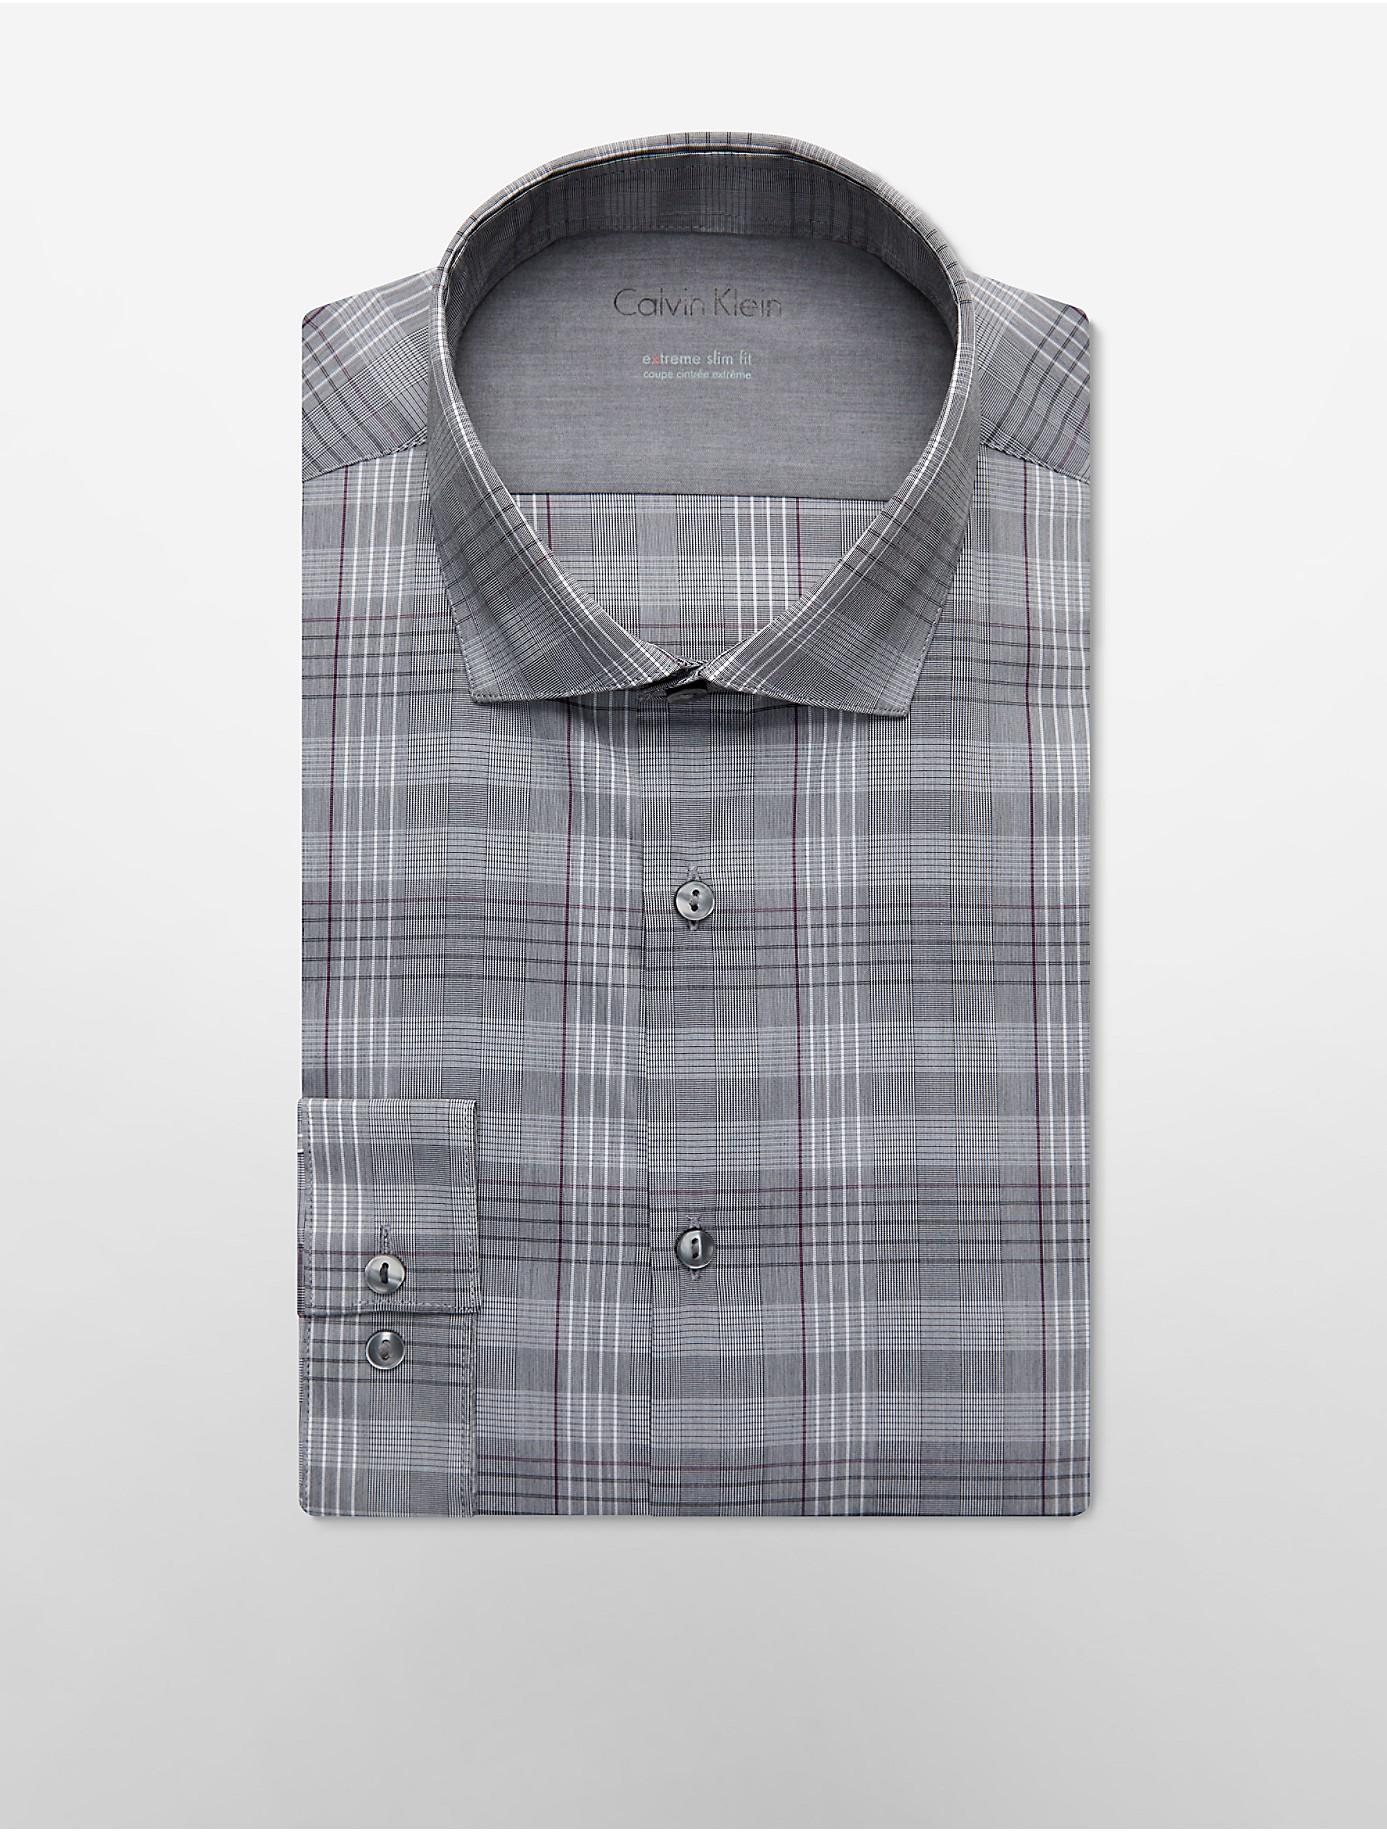 Calvin klein white label x fit ultra slim fit grey wine for Calvin klein x fit dress shirt